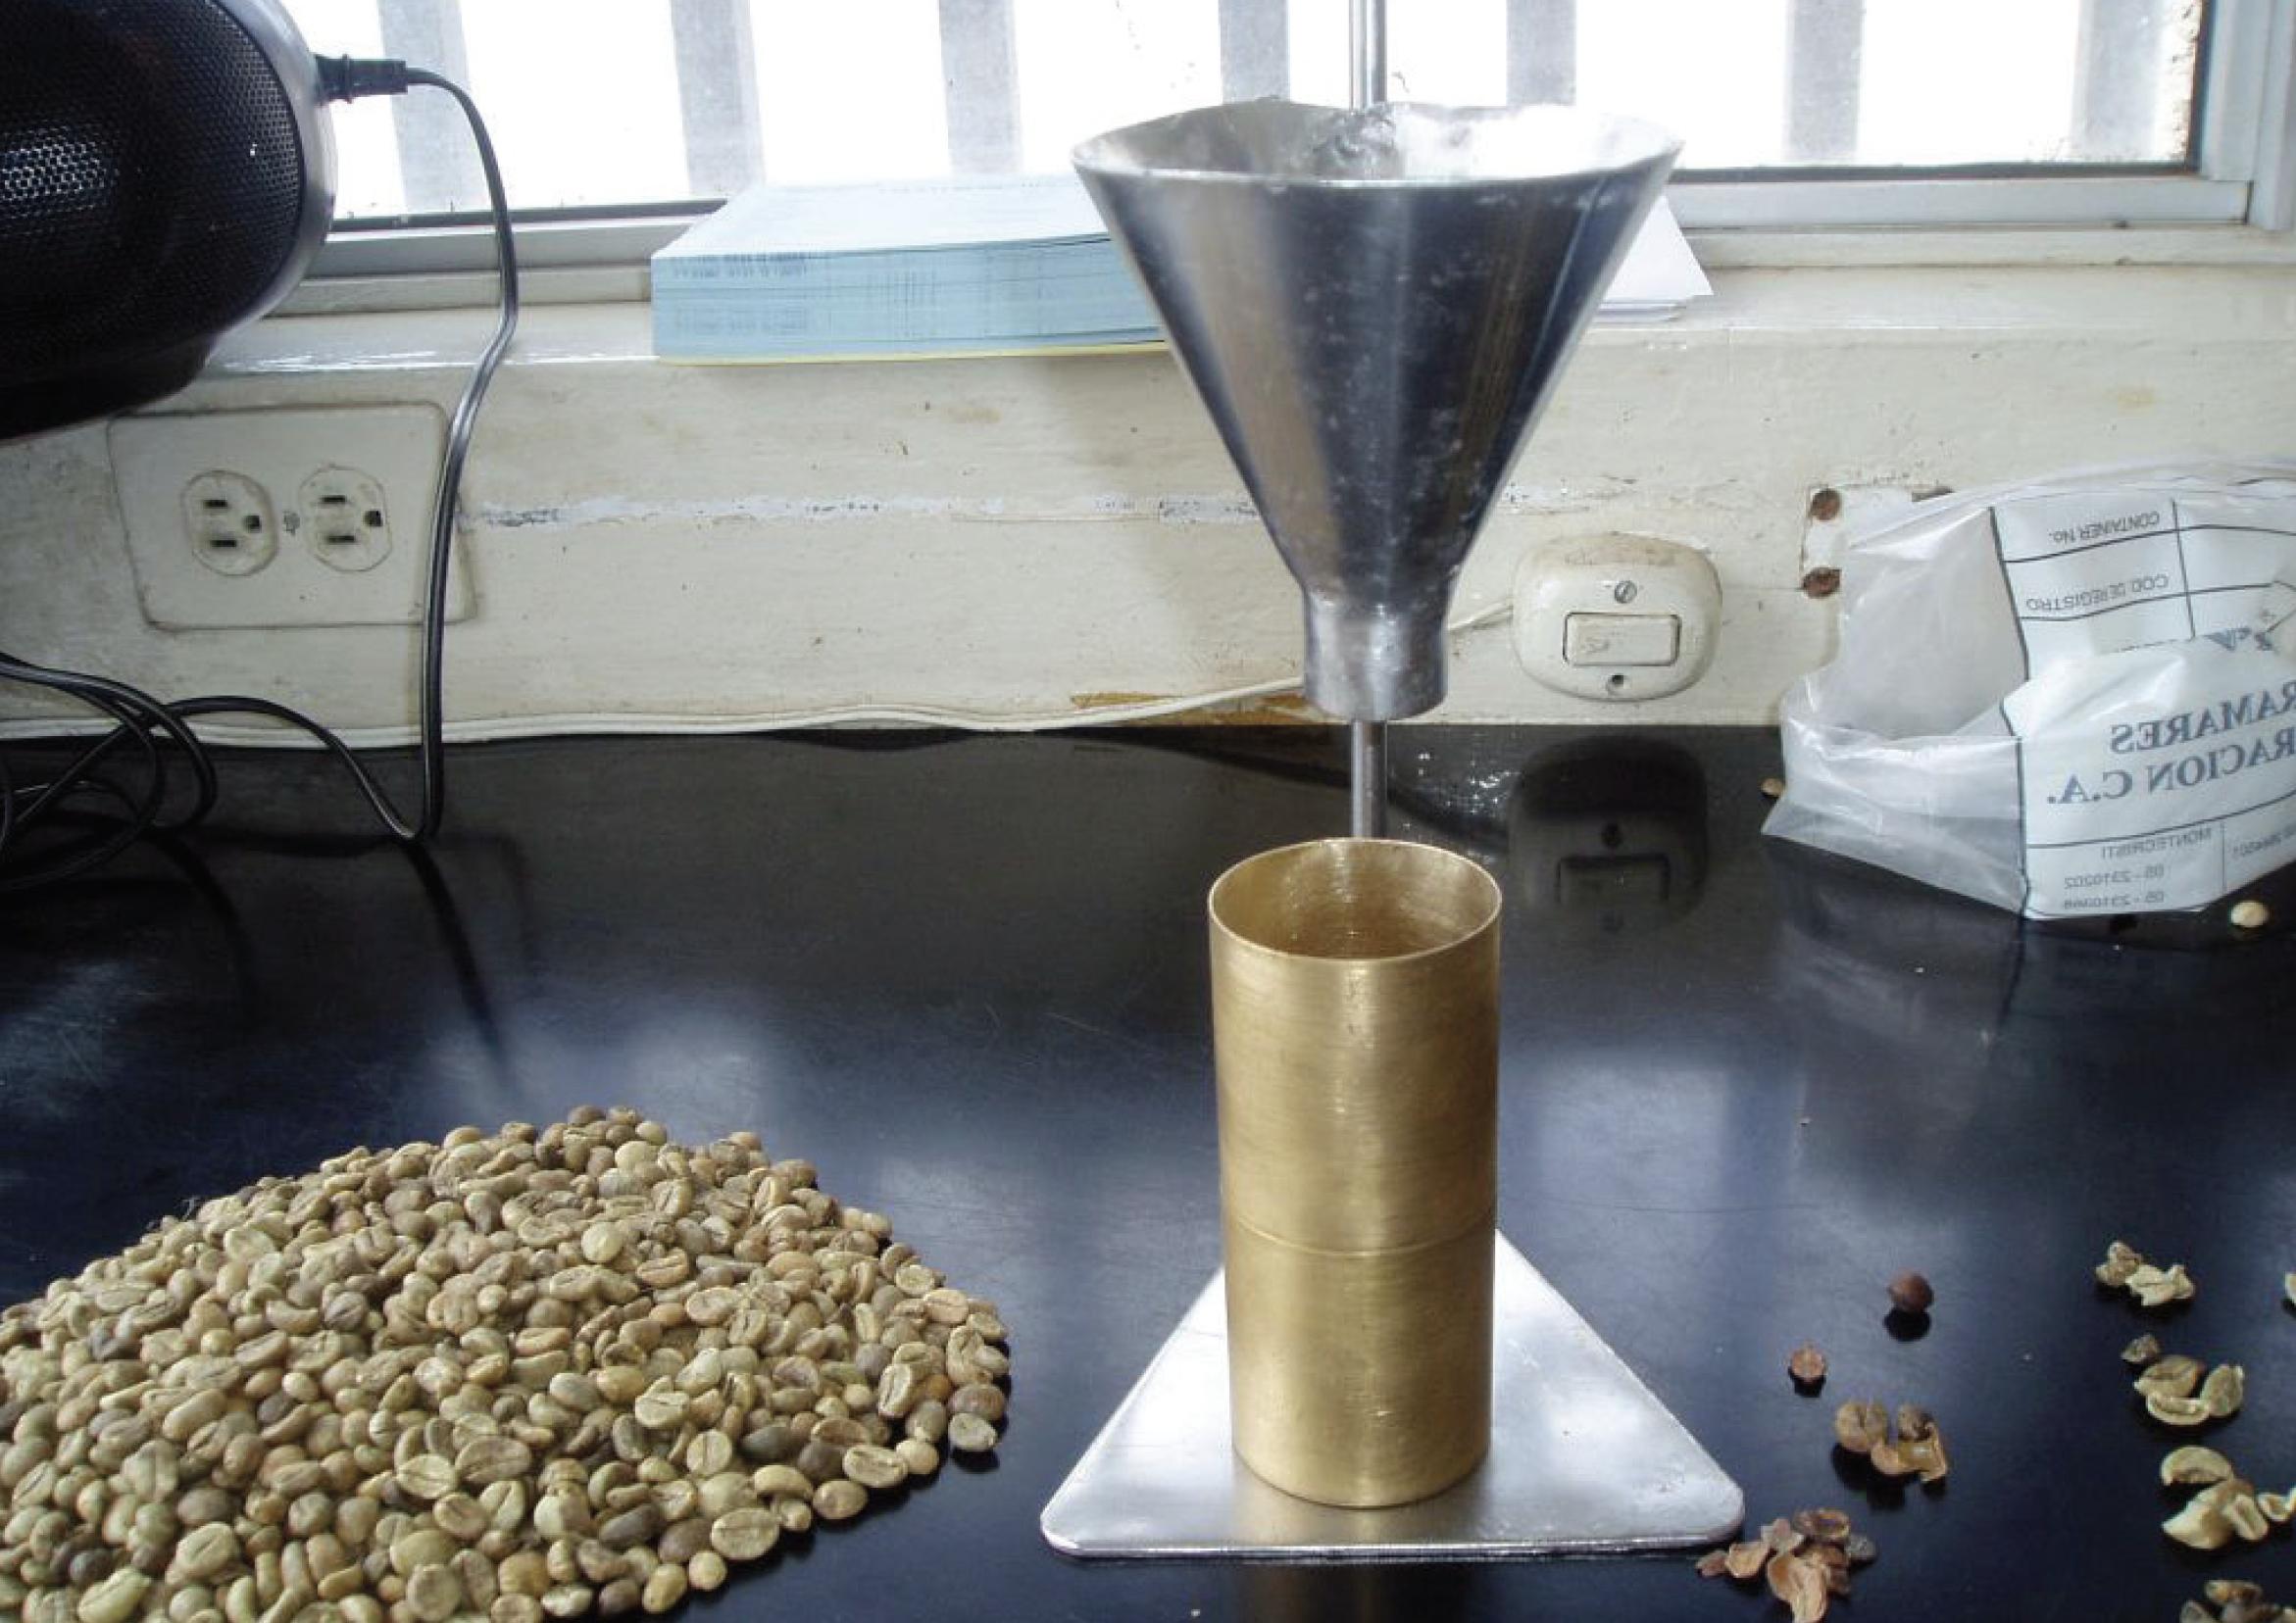 Testing coffee density